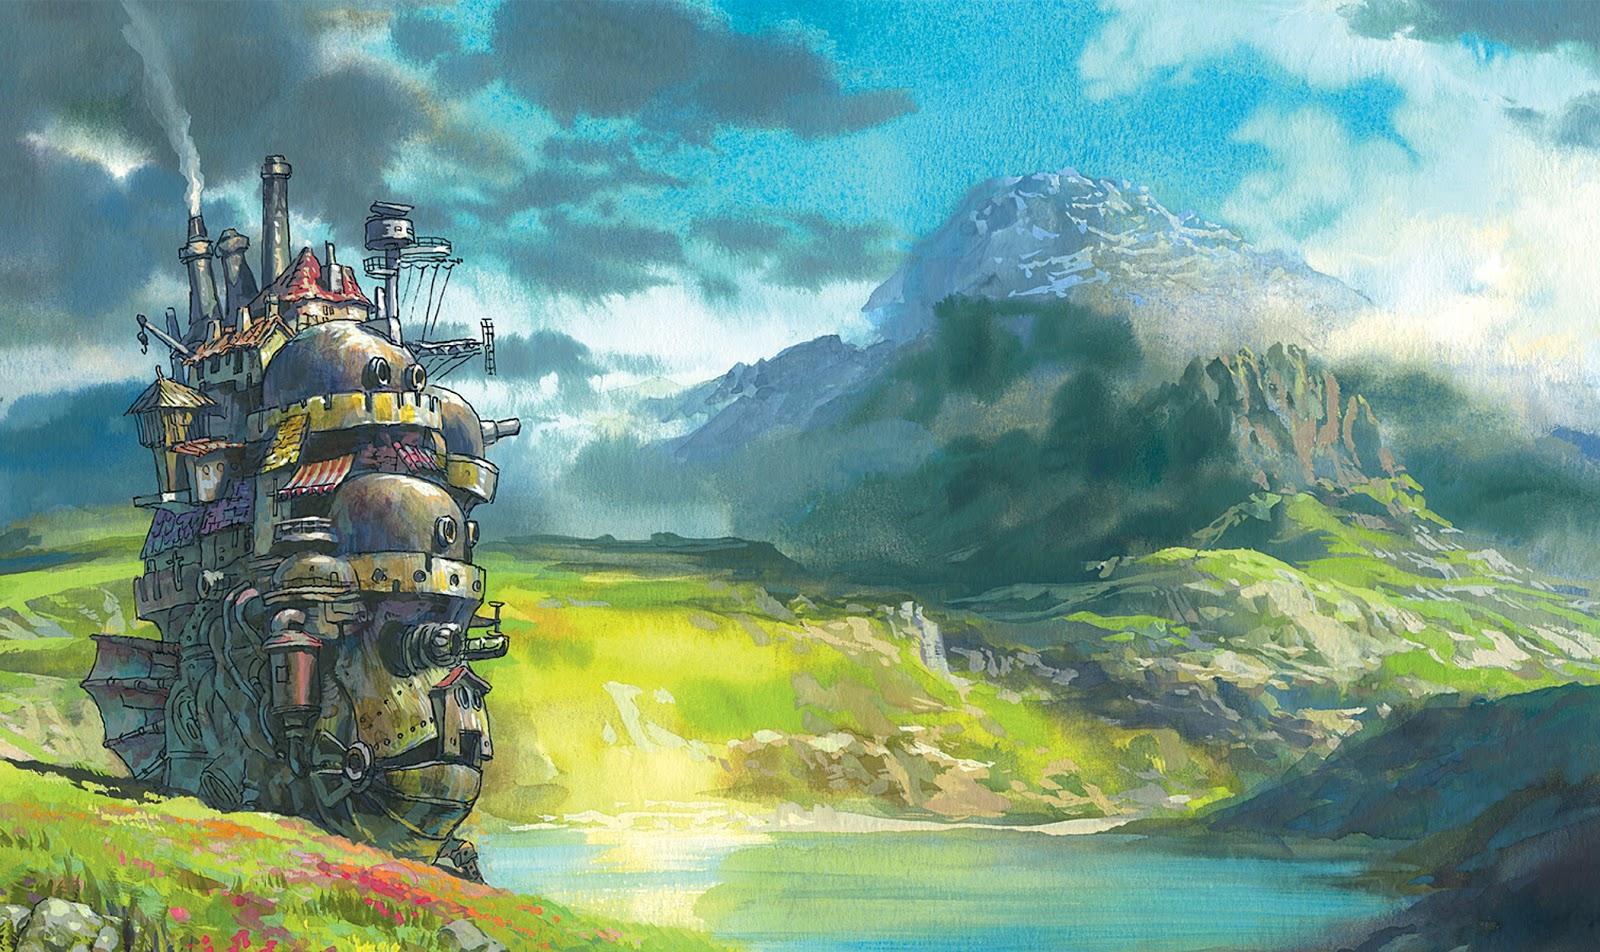 Home of Mini 720 Anime: Howl's Moving Castle 1080p BD